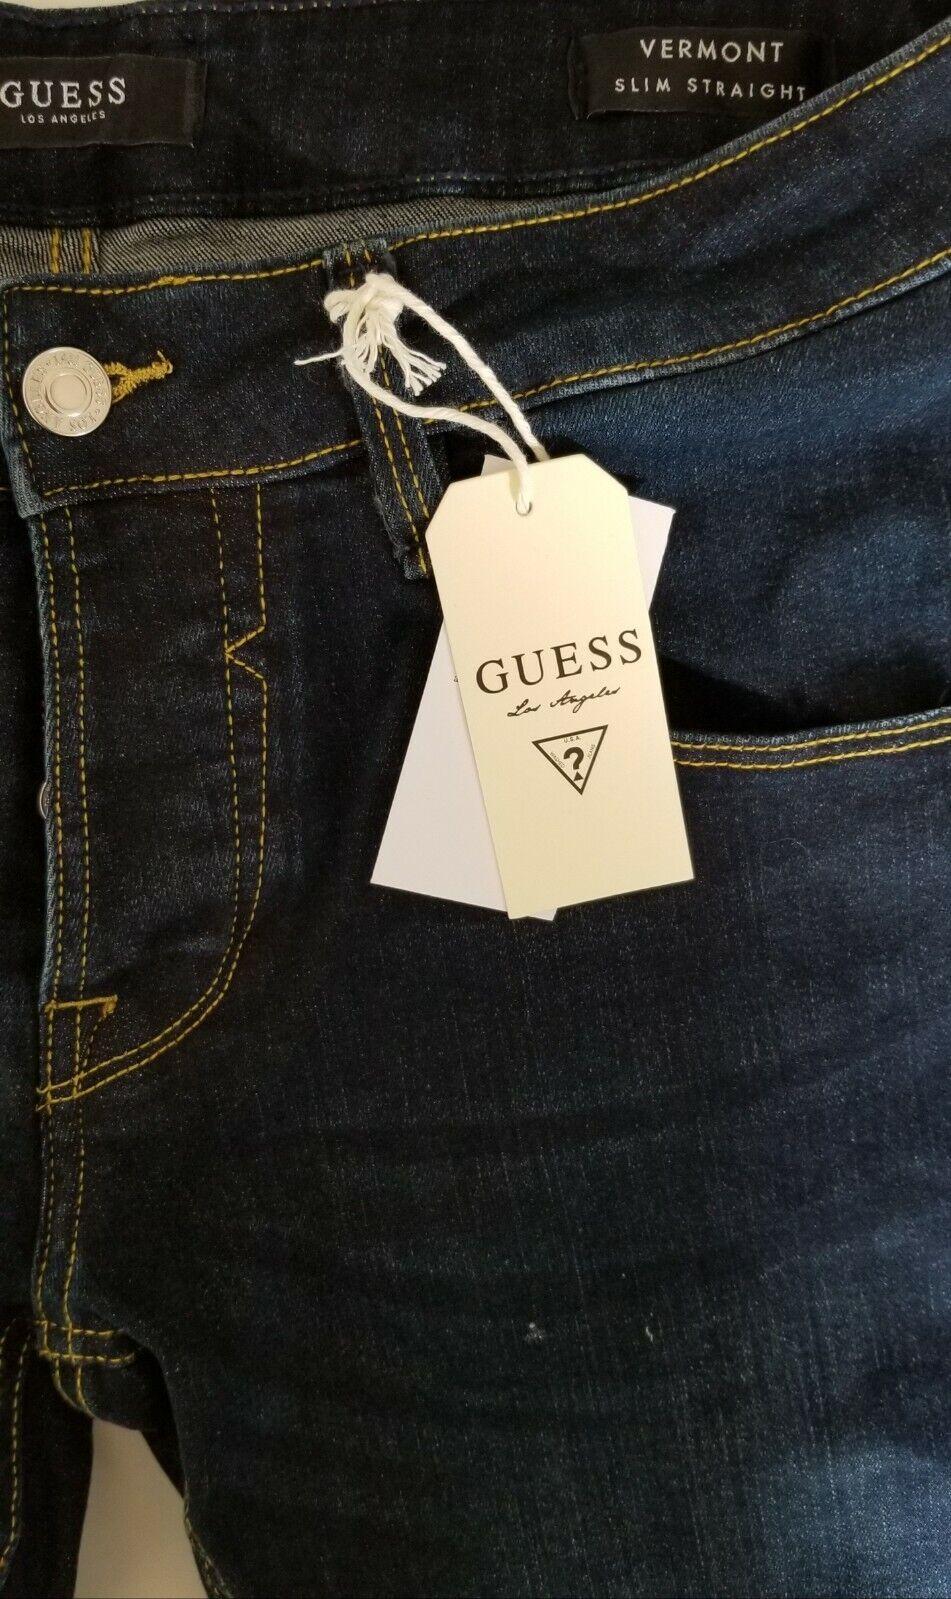 Herren Jeans GUESS Vermont - Dunkelblau - Aktionspreis!